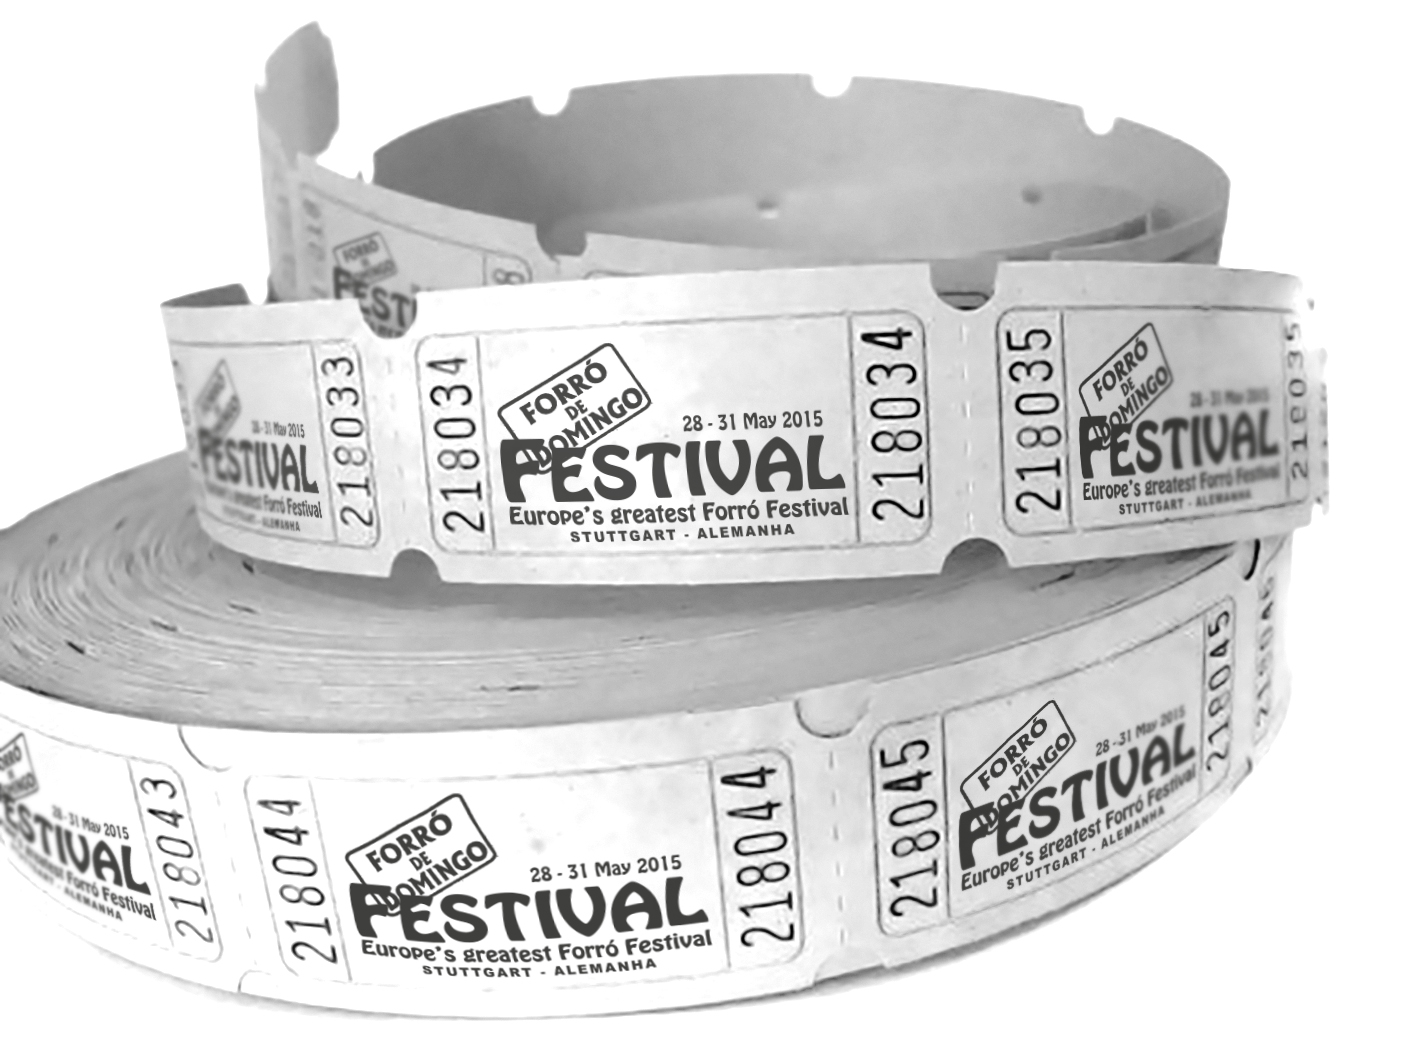 https://forrofestival.com/wp-content/uploads/2015/02/FdD-ticket_4-dias.jpg